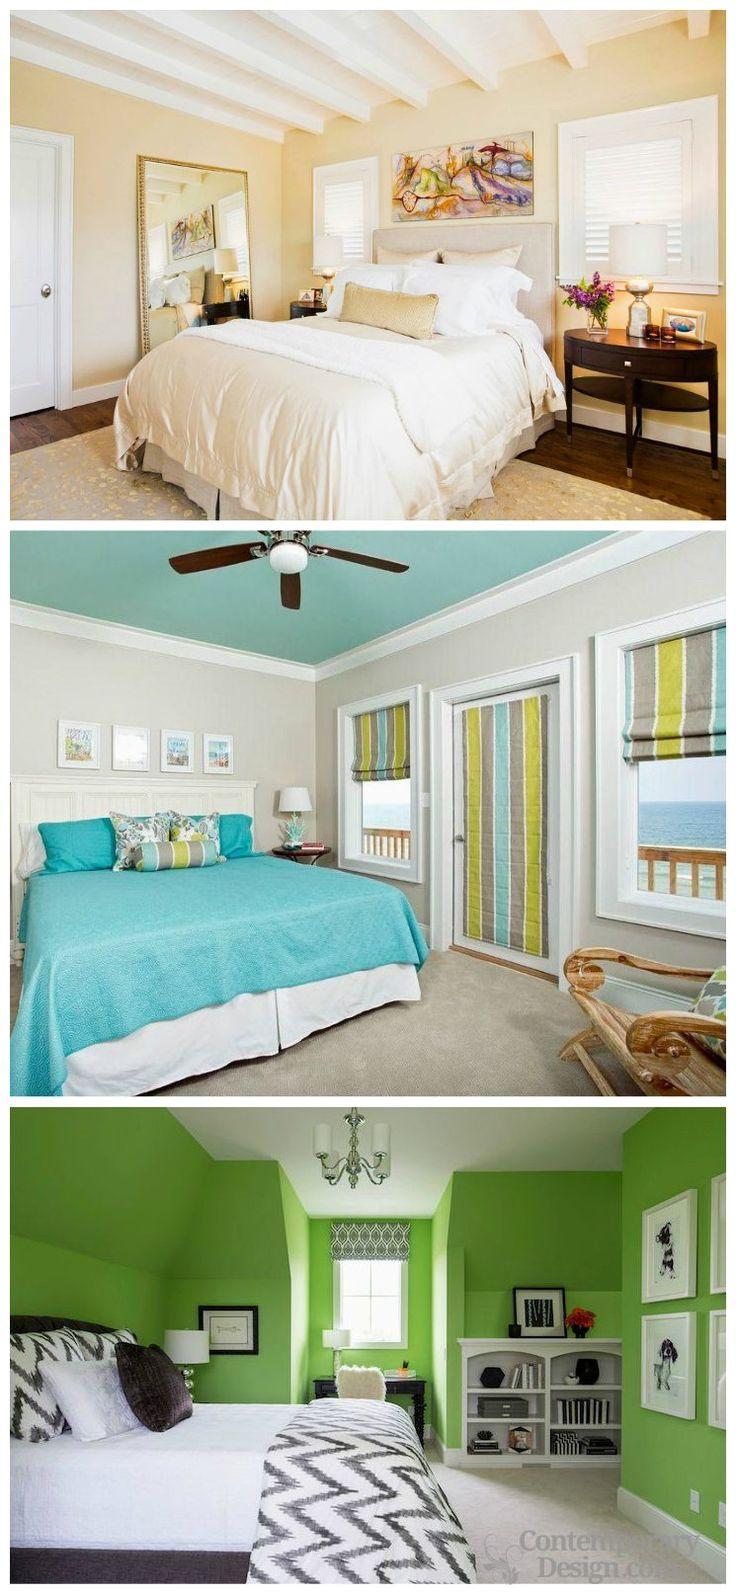 164 best room design images on pinterest bedroom ideas for the